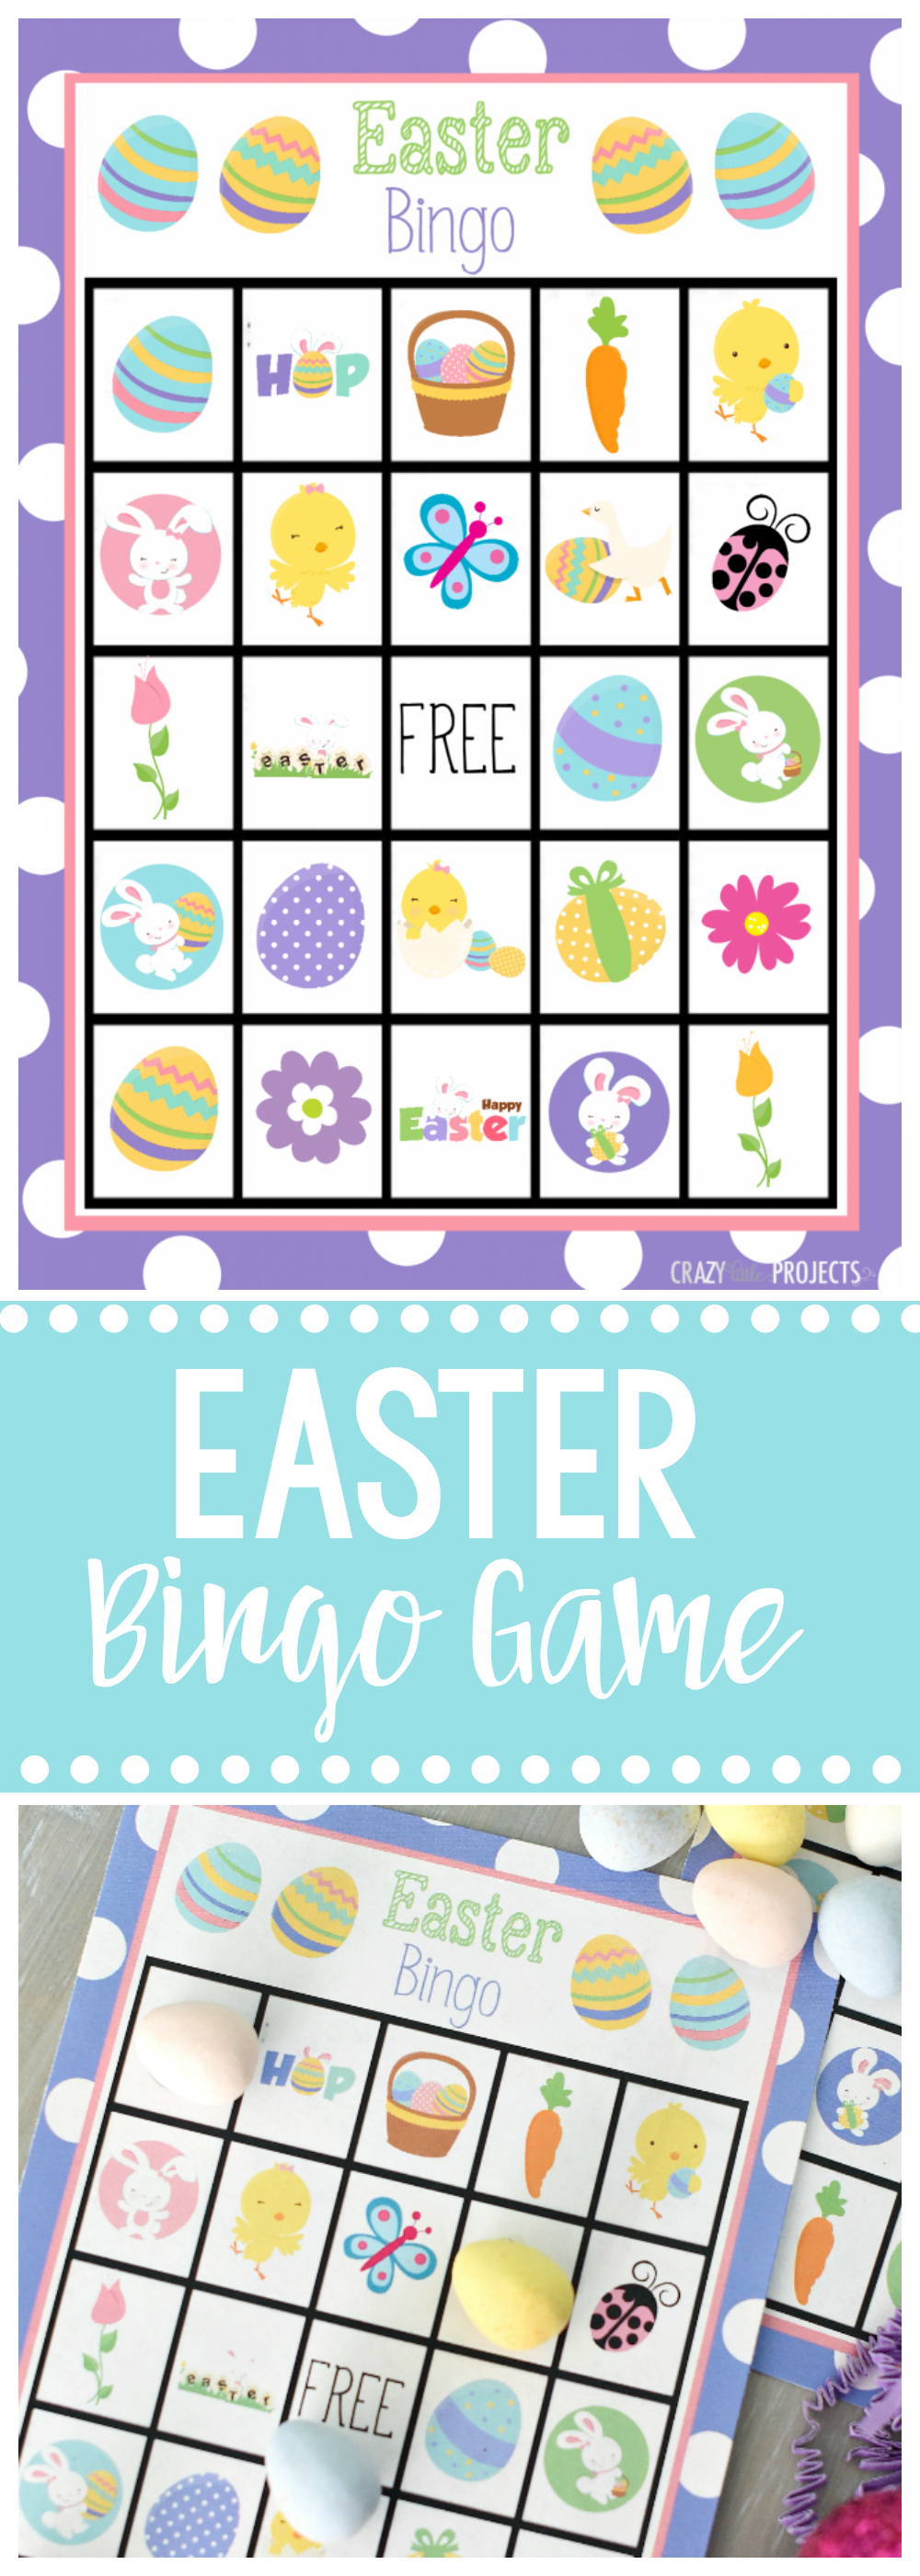 Free Printable Easter Bingo Game – Fun-Squared - Free Printable Religious Easter Bingo Cards